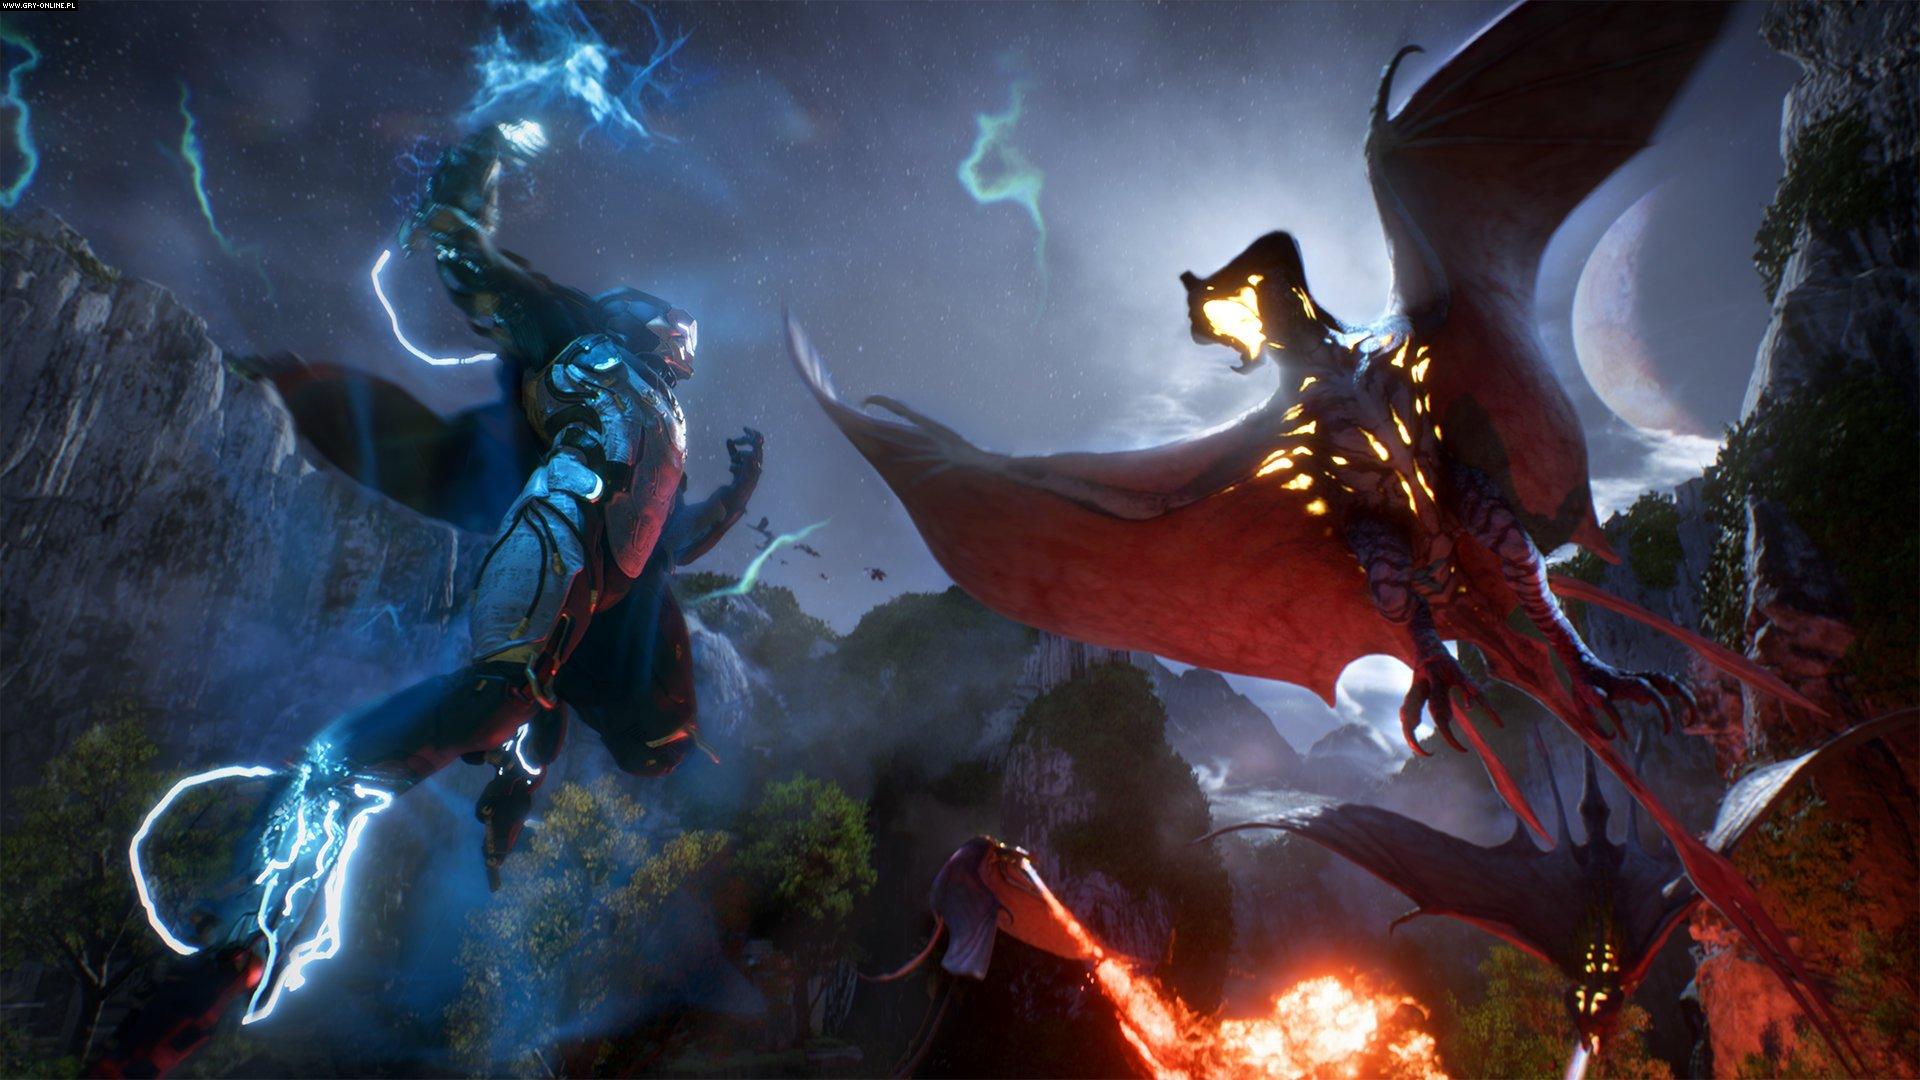 Anthem PC, PS4, XONE Games Image 1/52, BioWare Corporation, Electronic Arts Inc.